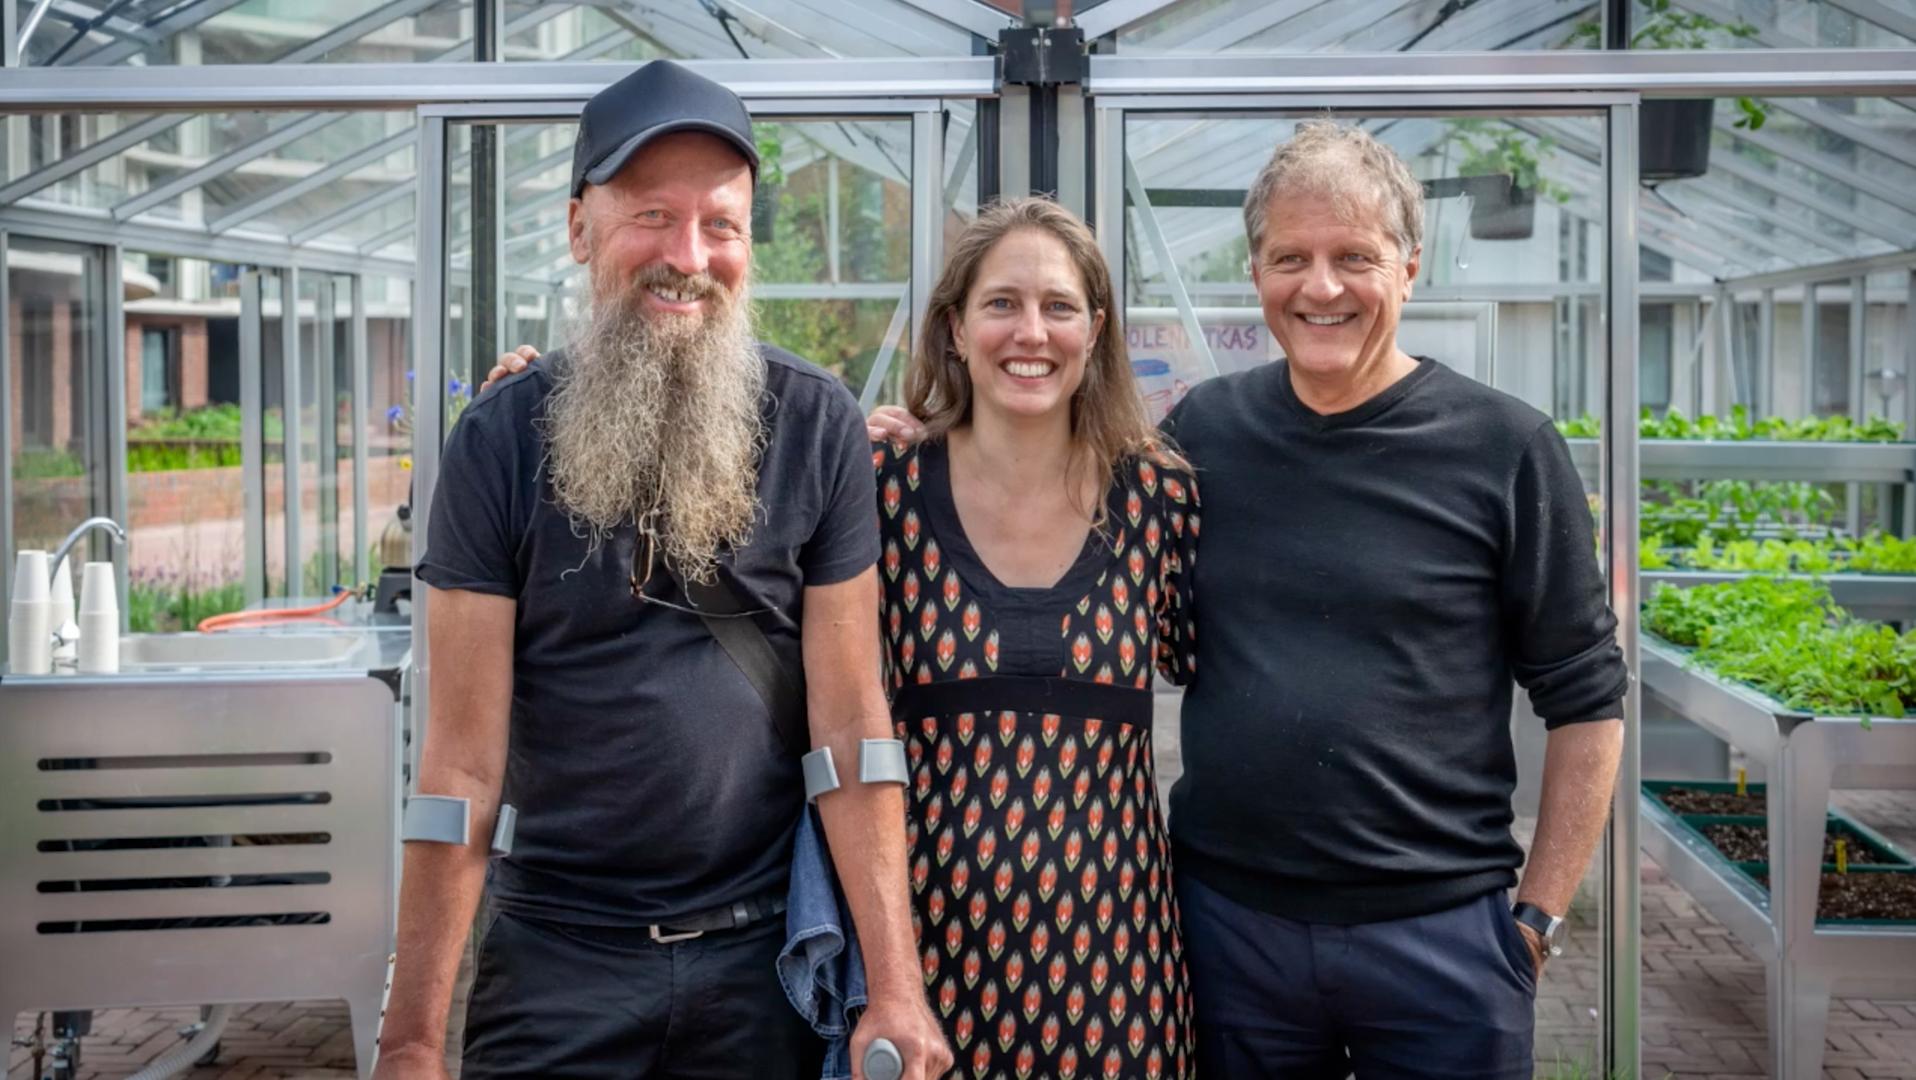 Rhapsody wins Amsterdam Architecture Prize